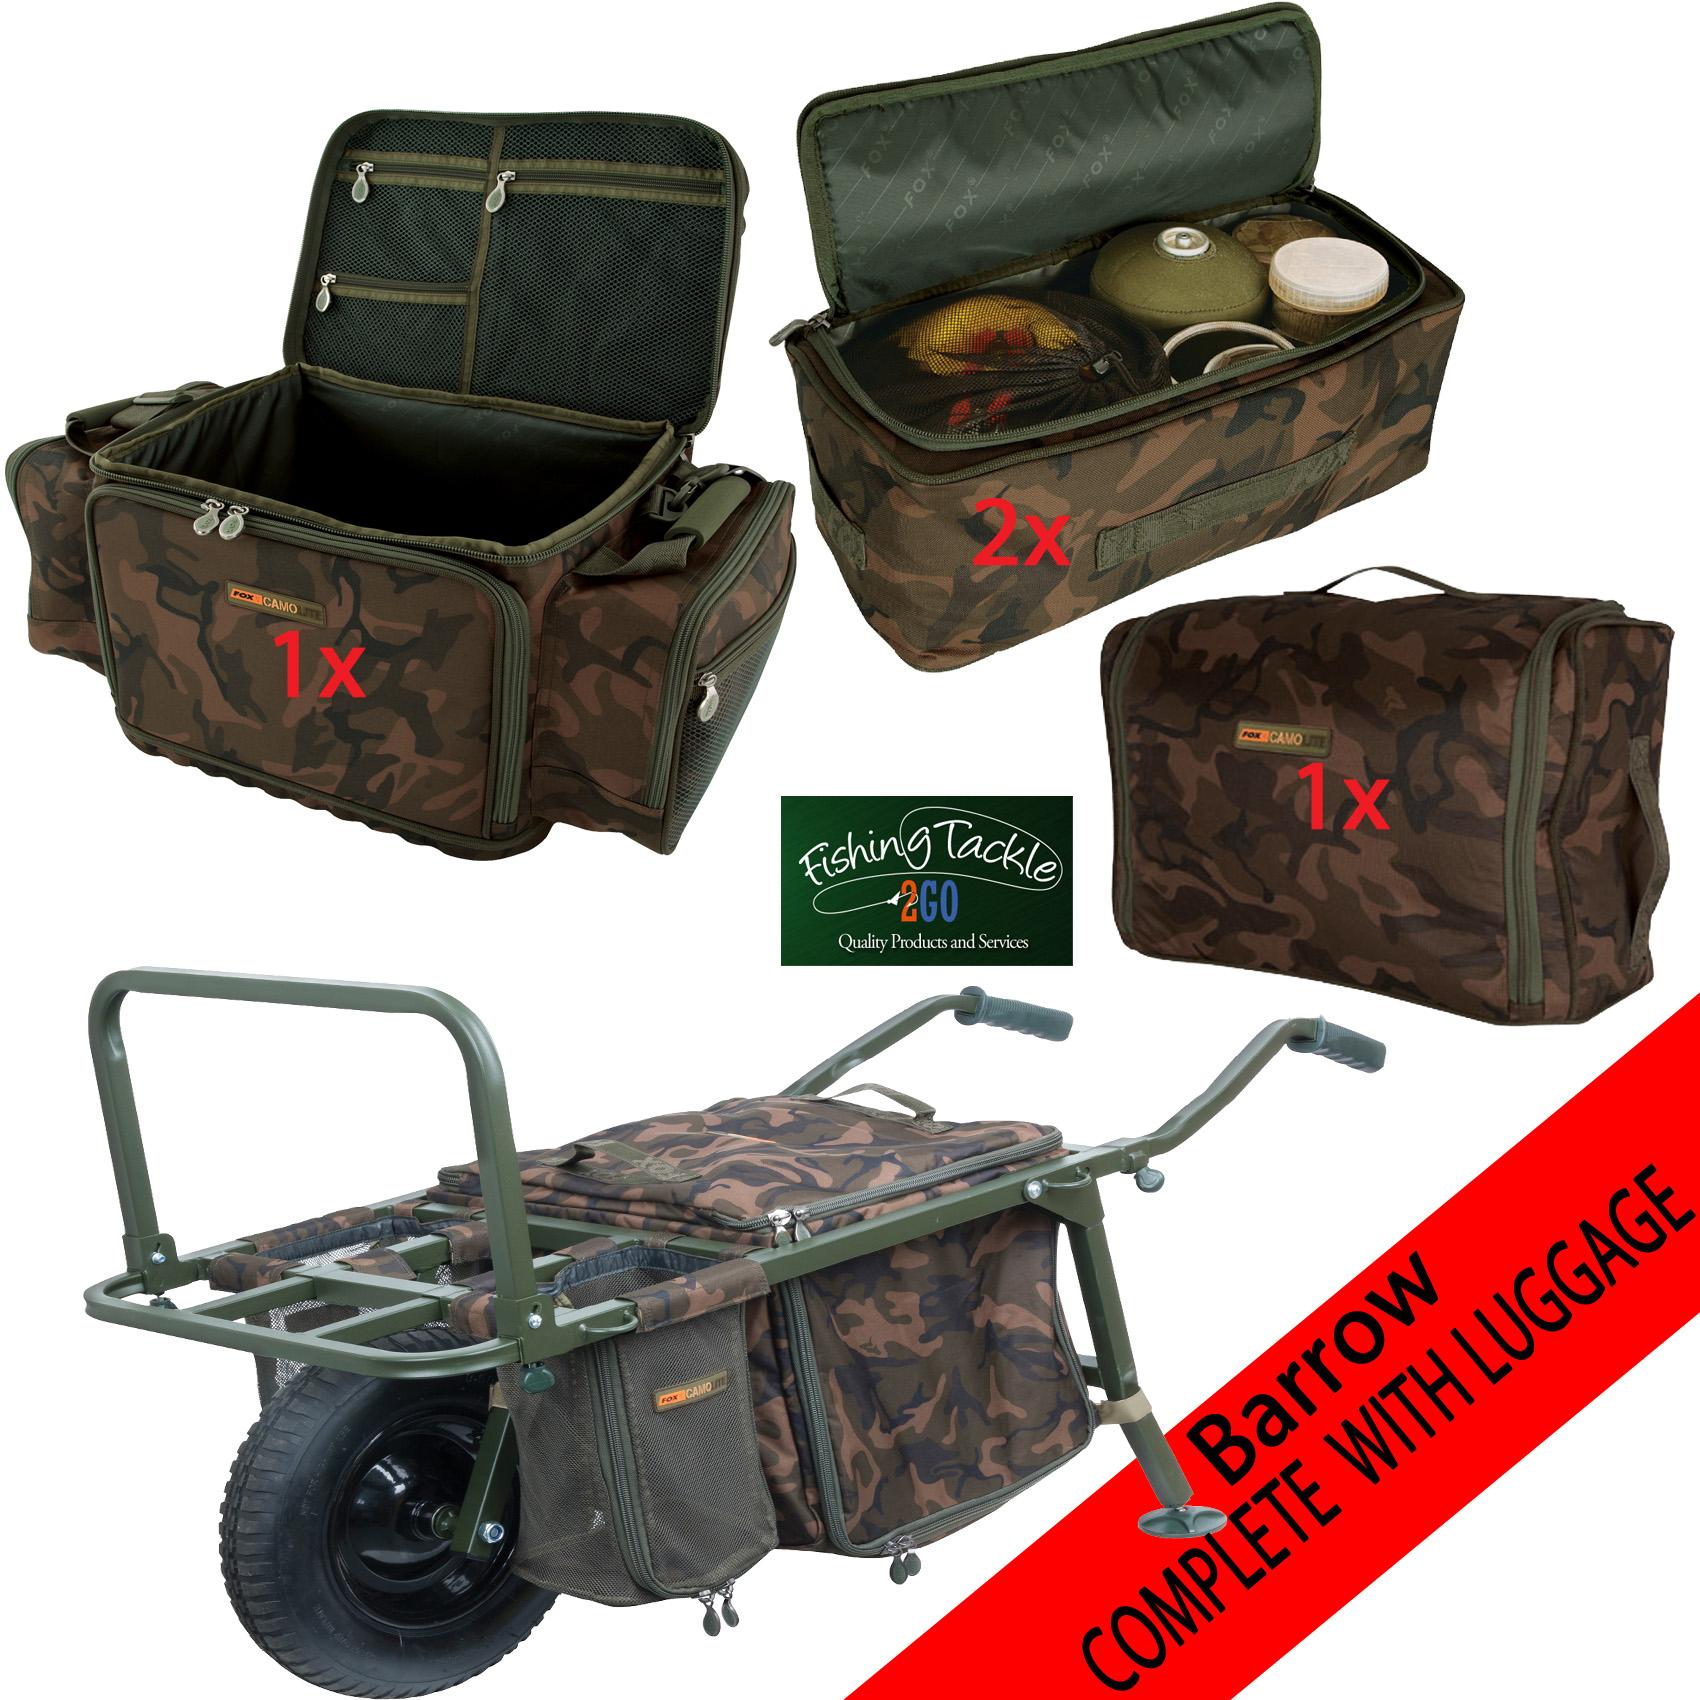 Fox Explorer Barrow Carp Inc Strap Complete with Camolite Luggage Set